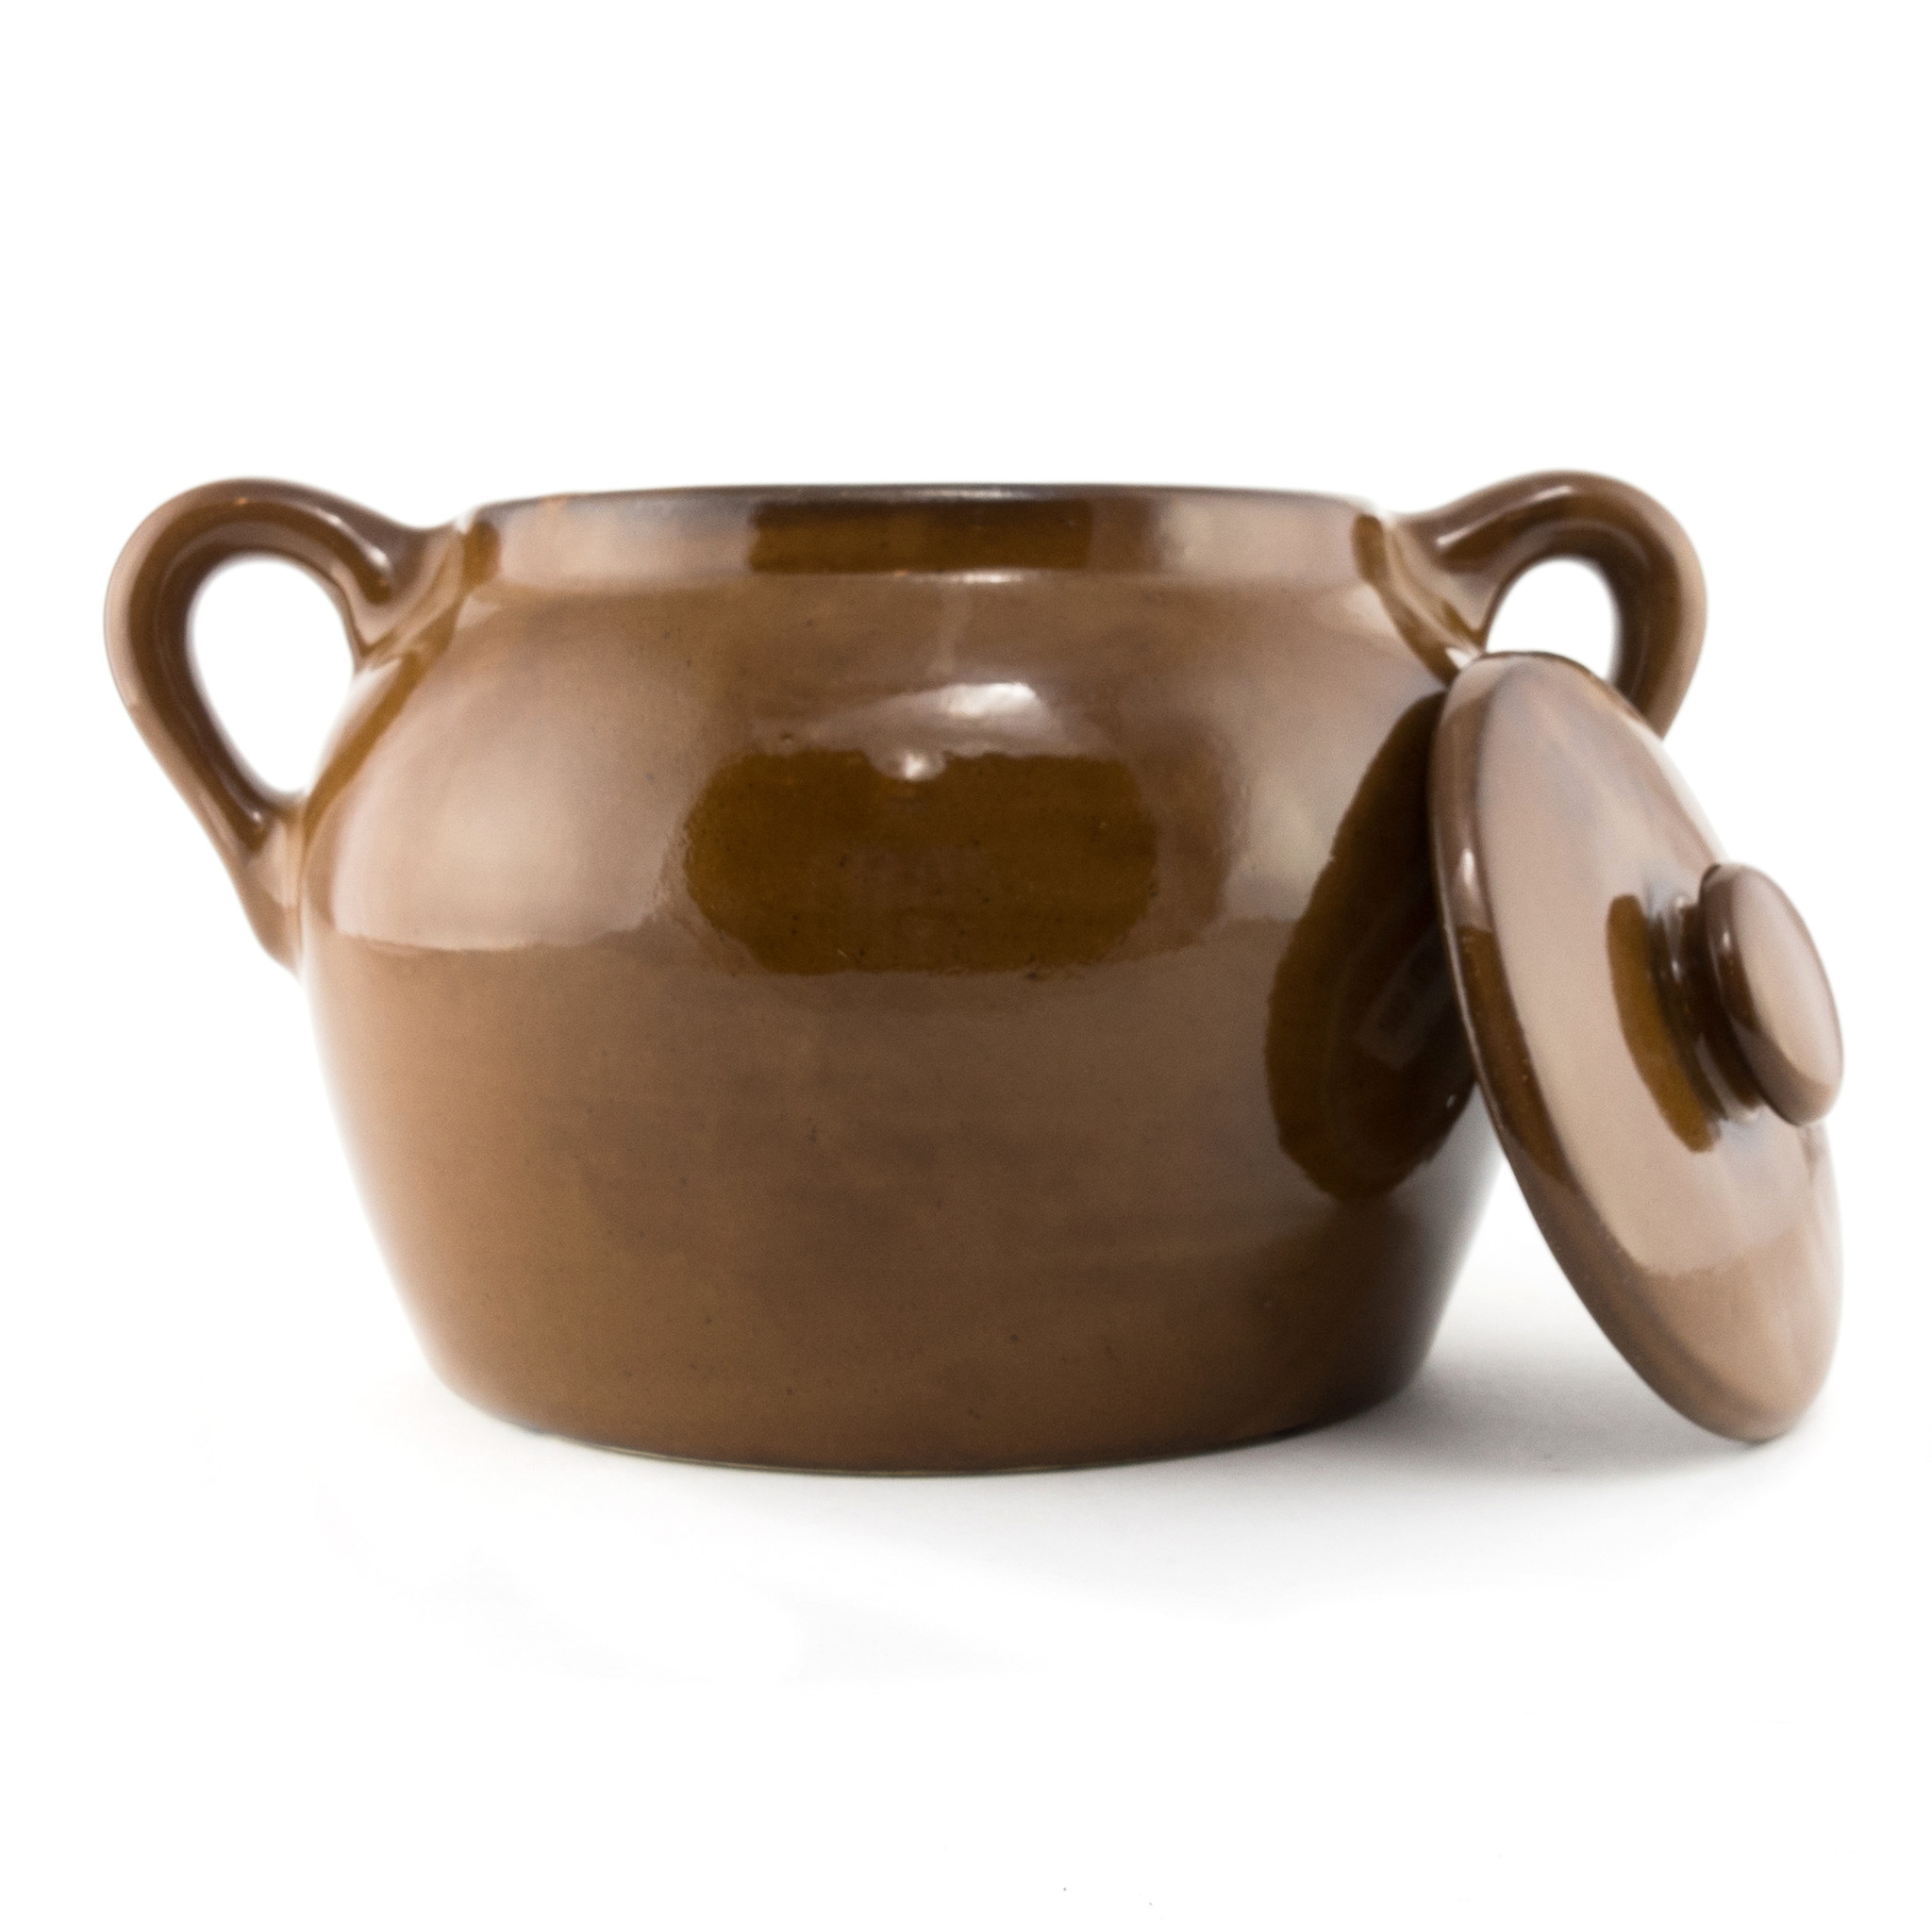 Medalta Ware Reproduction Bean Pot